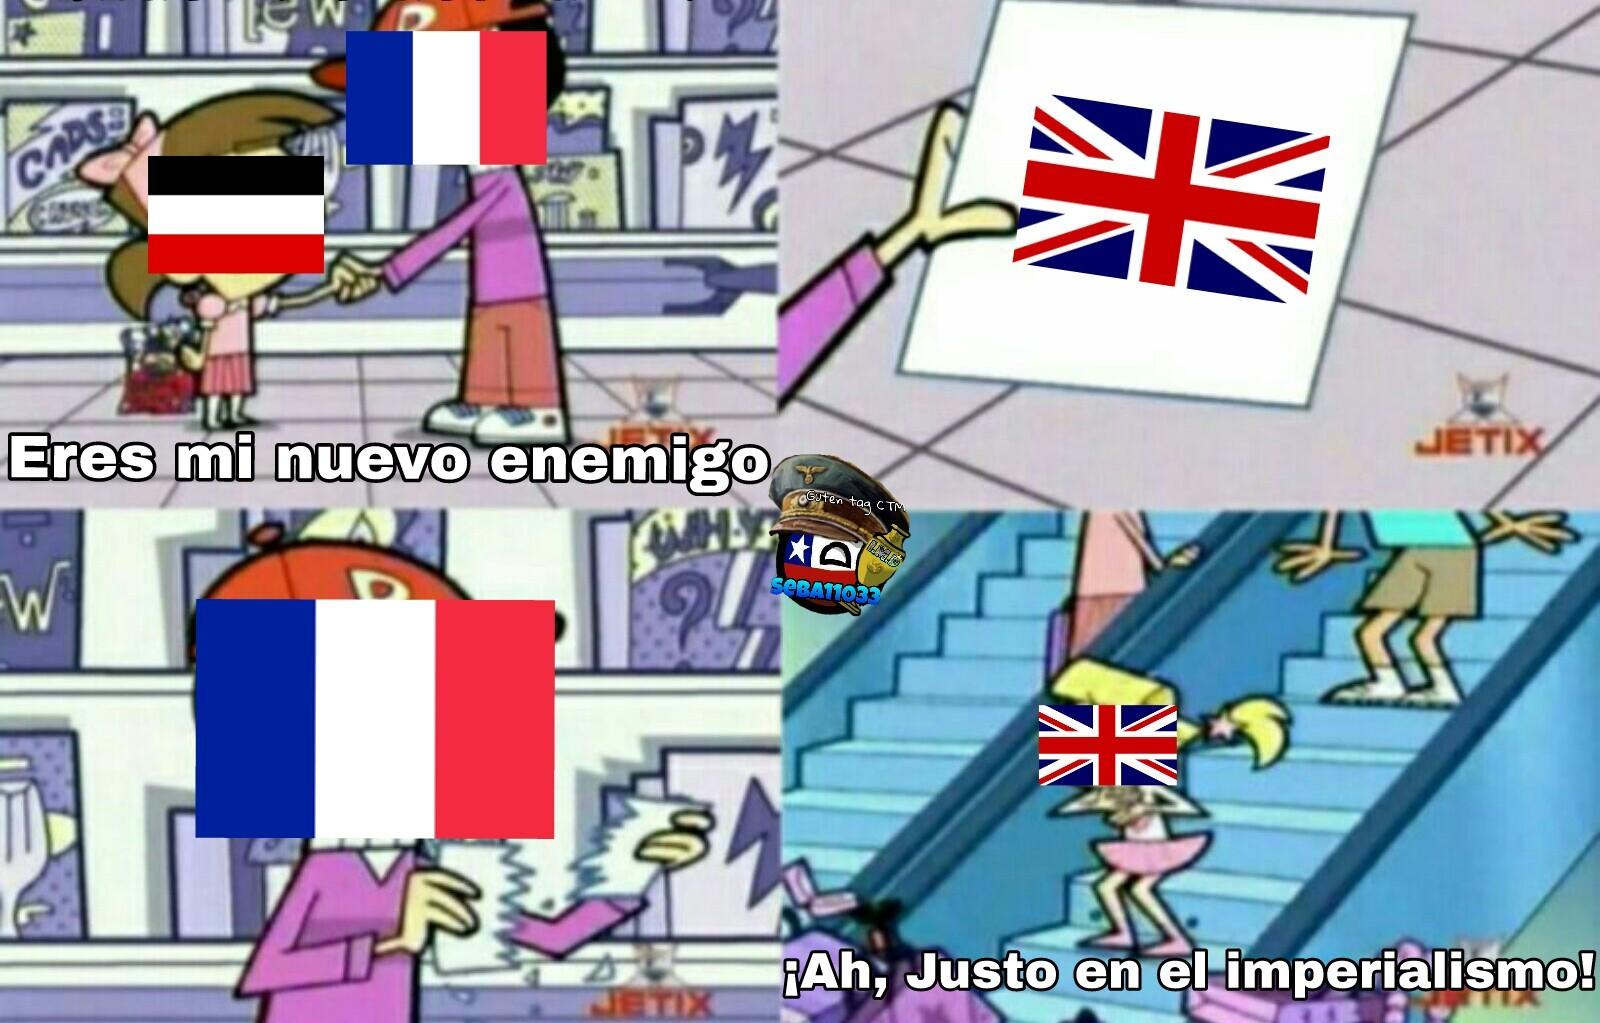 Post Guerra franco-prusiana - meme